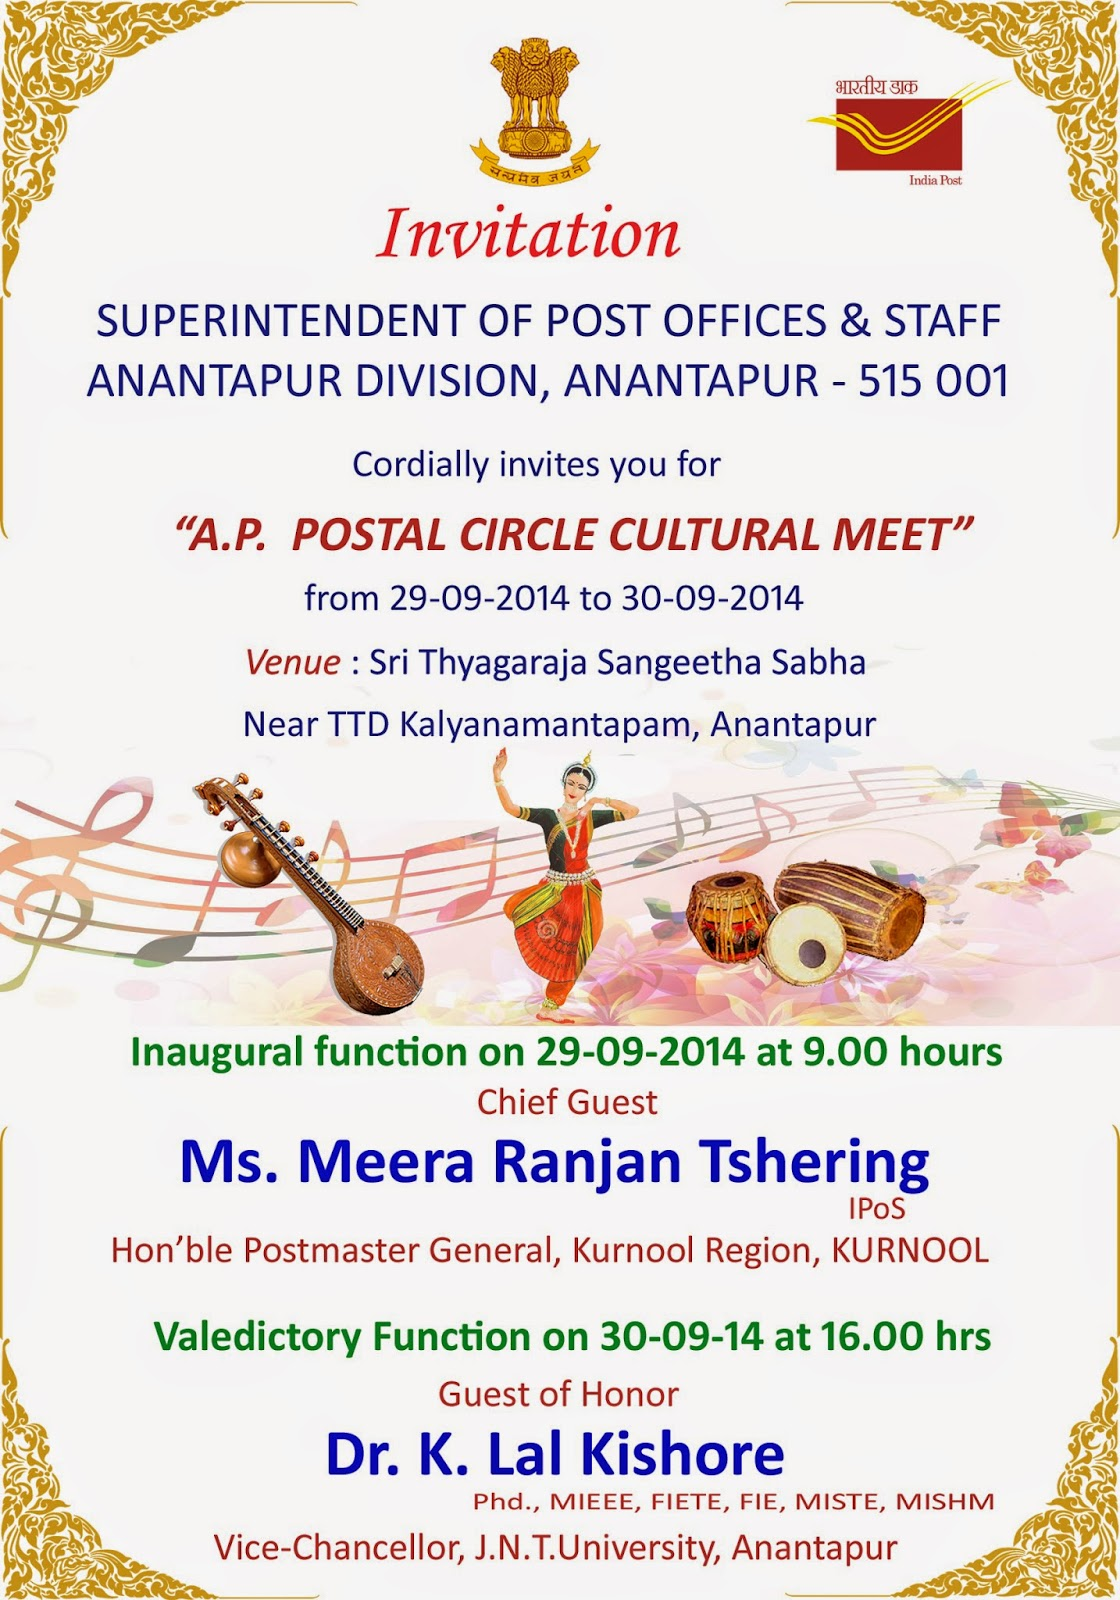 ANANTAPUR DIVISION: Cultural Meet Invitation